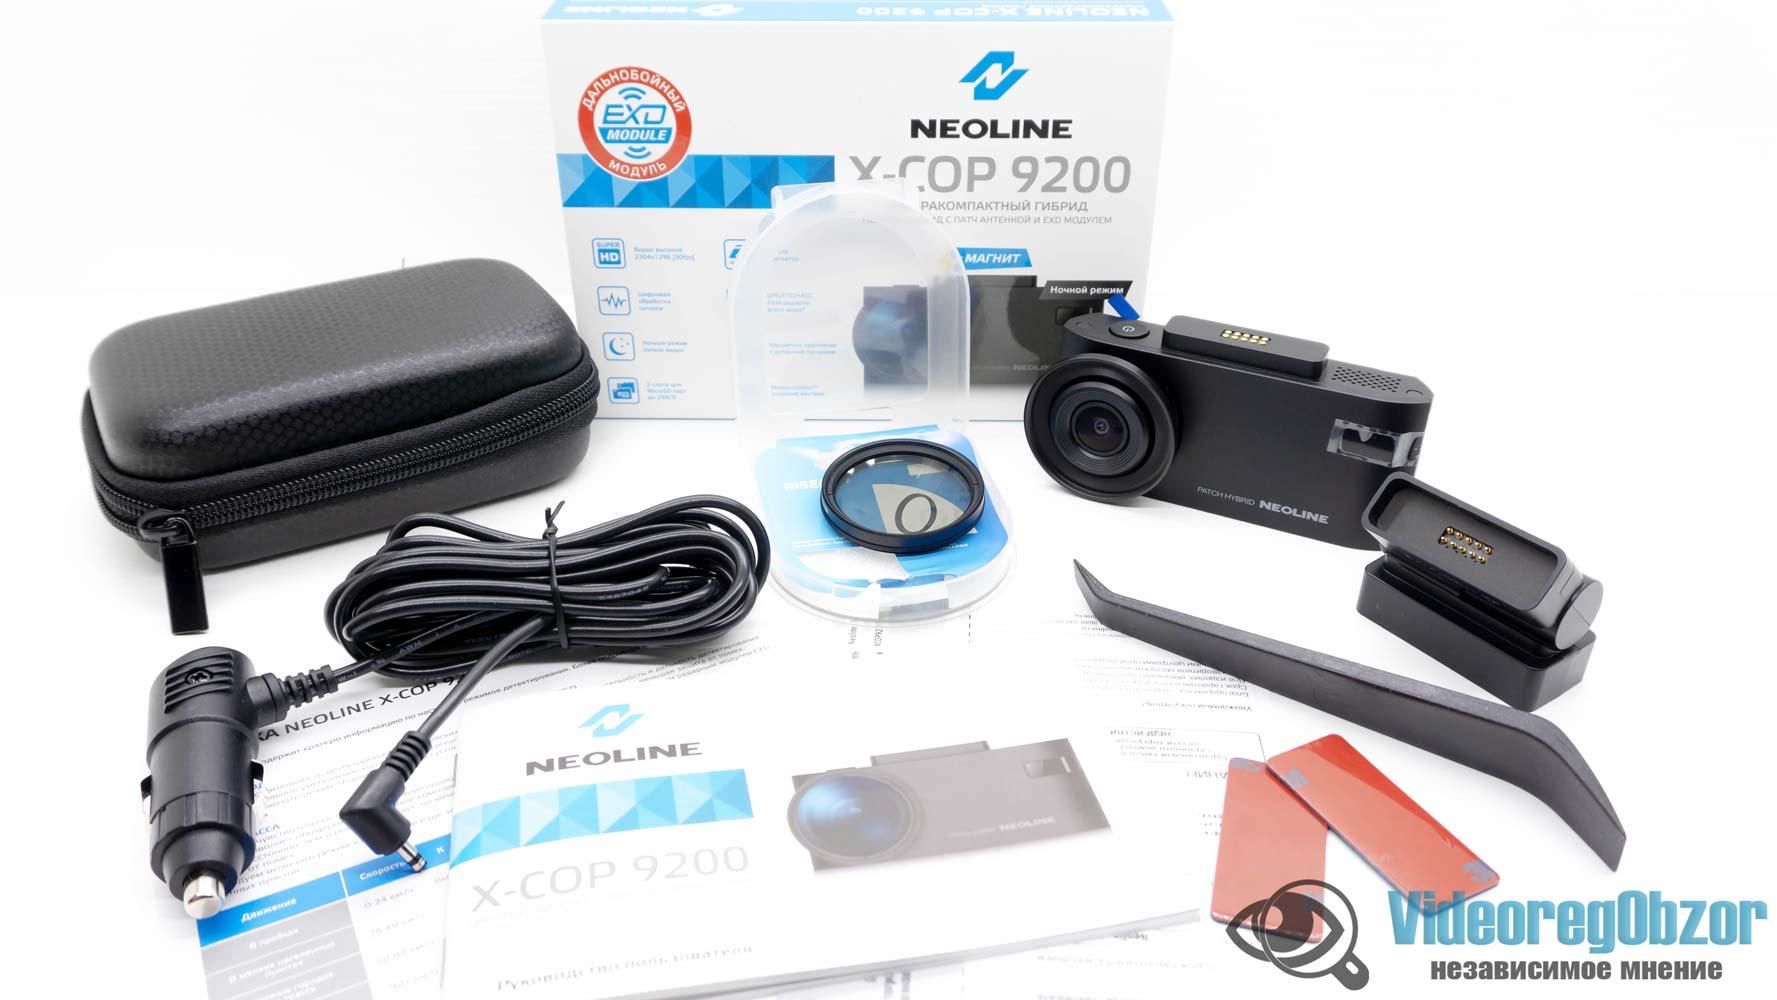 Neoline X COP 9200 обзор 5 VideoregObzor Neoline X-COP 9200: обзор видеорегистратора с радар-детектором